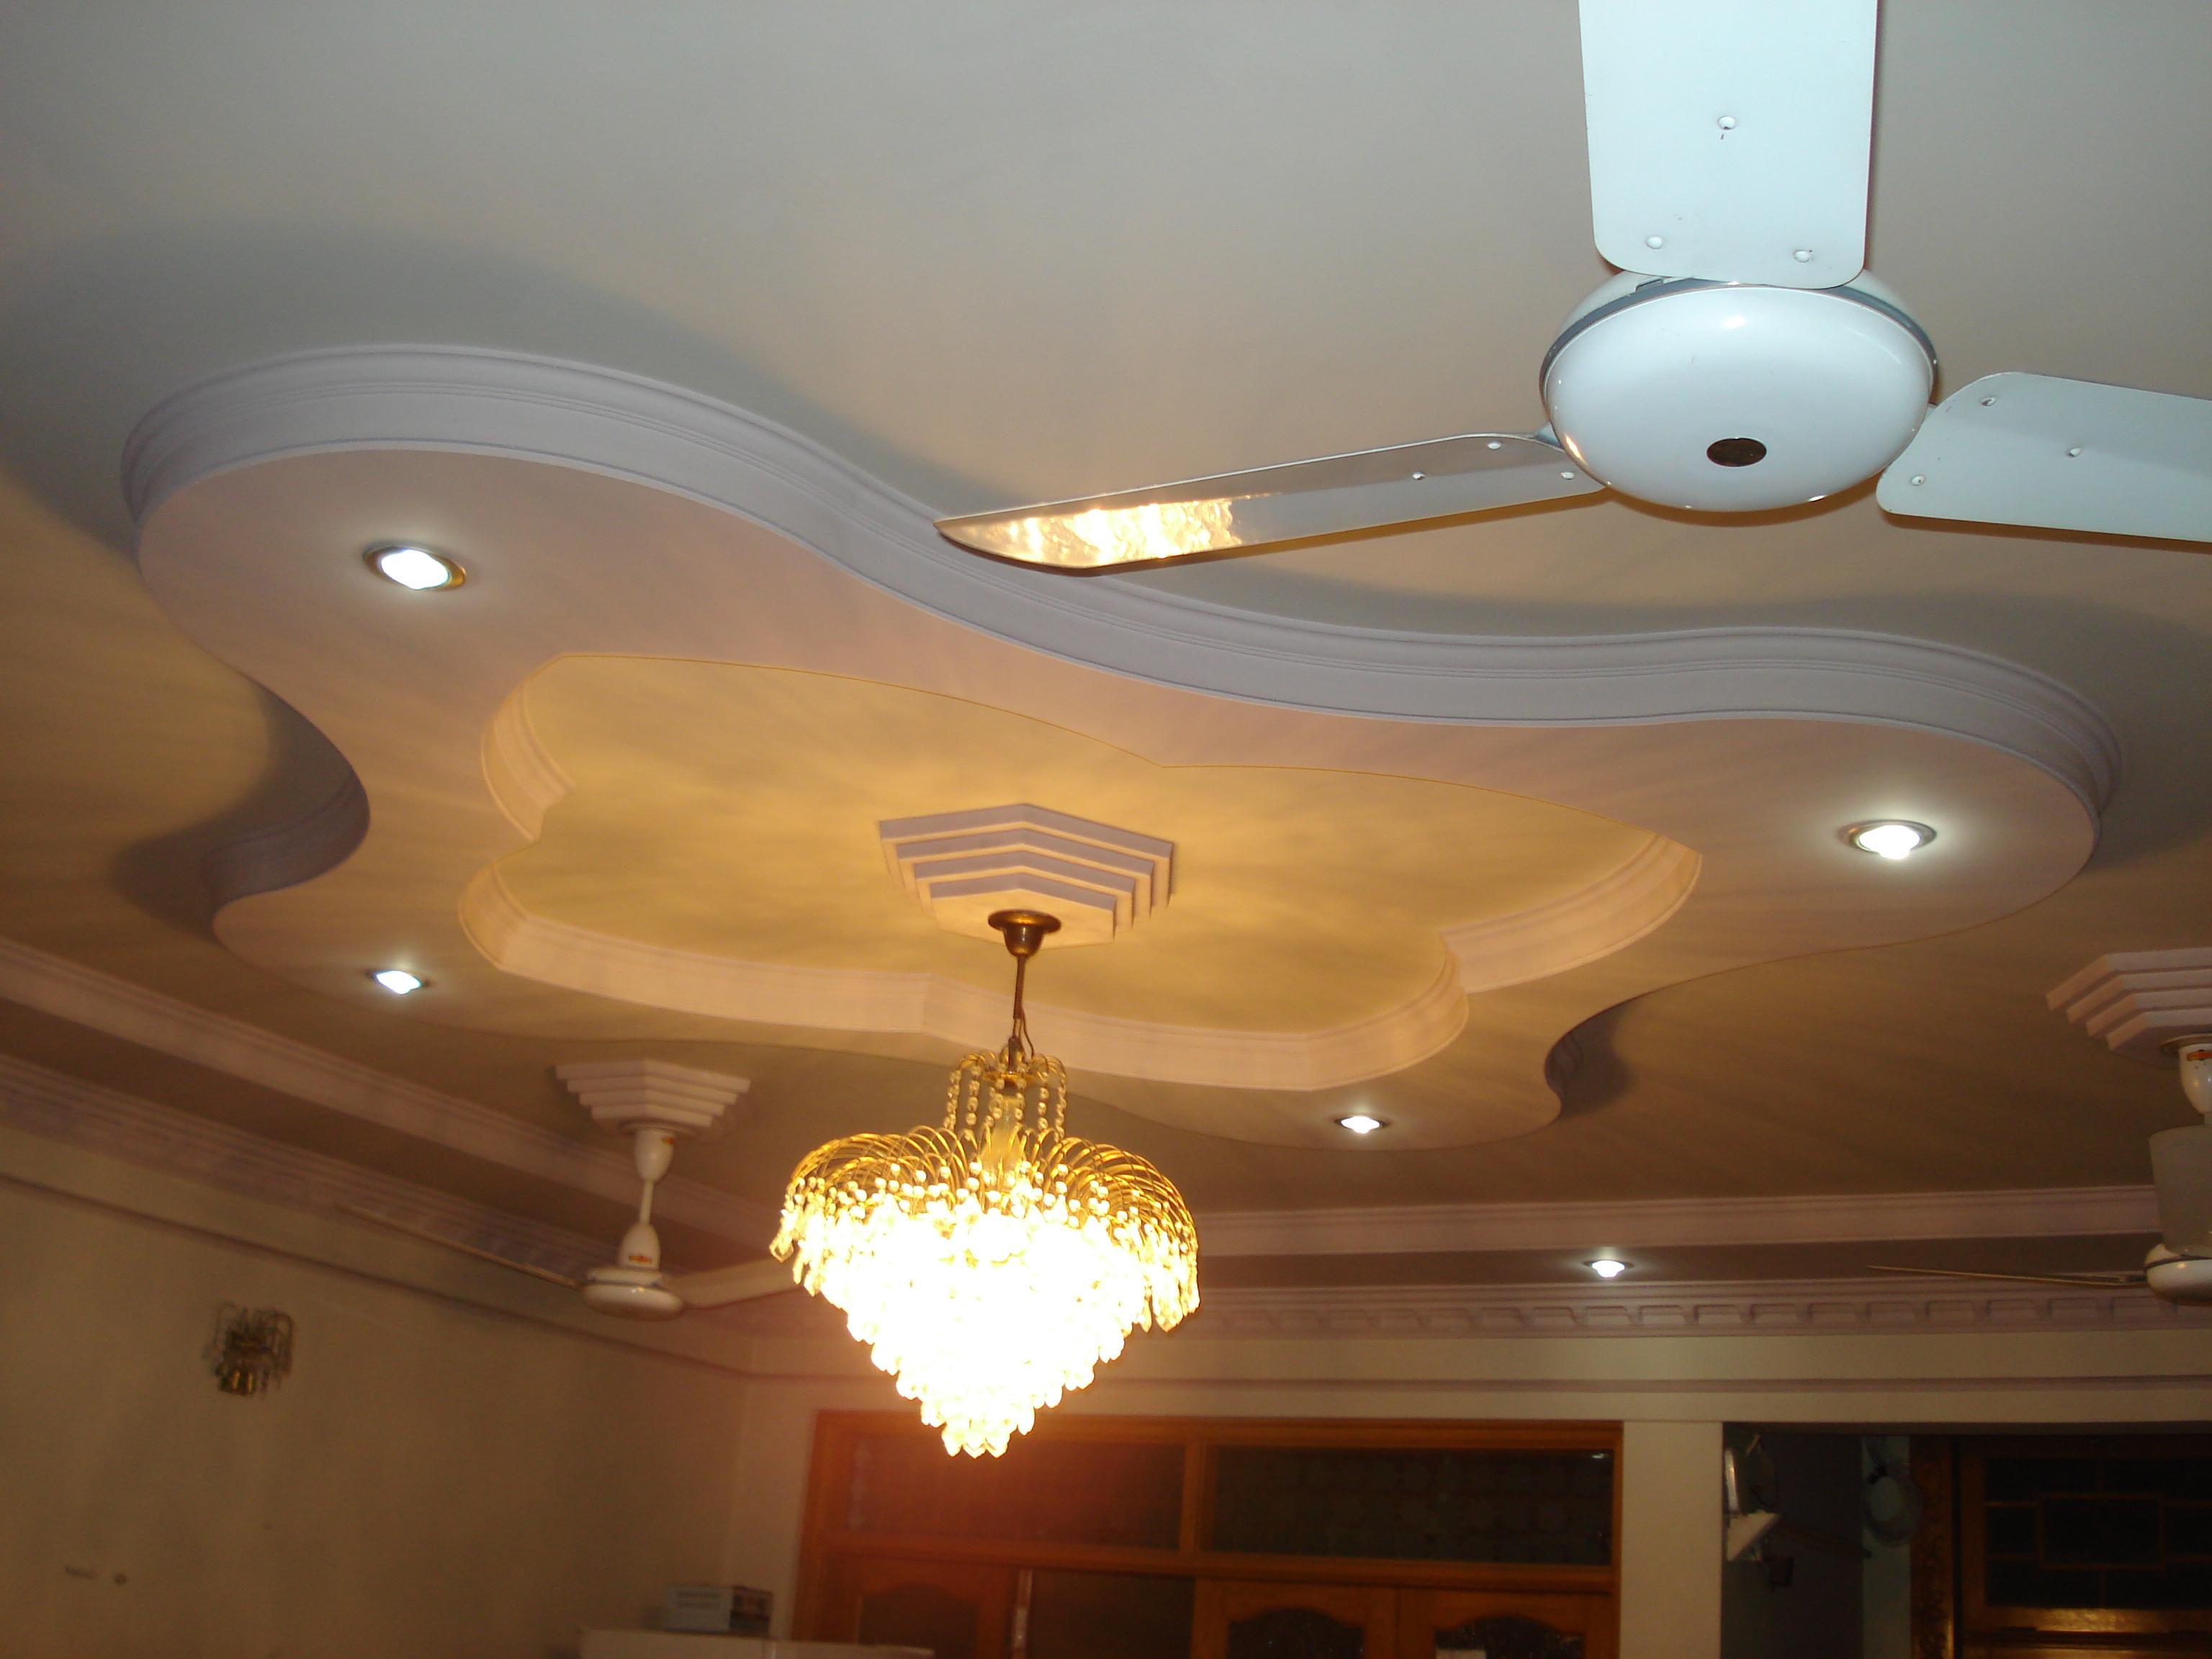 Pop ceiling design gharexpert for Pop interior ceiling designs